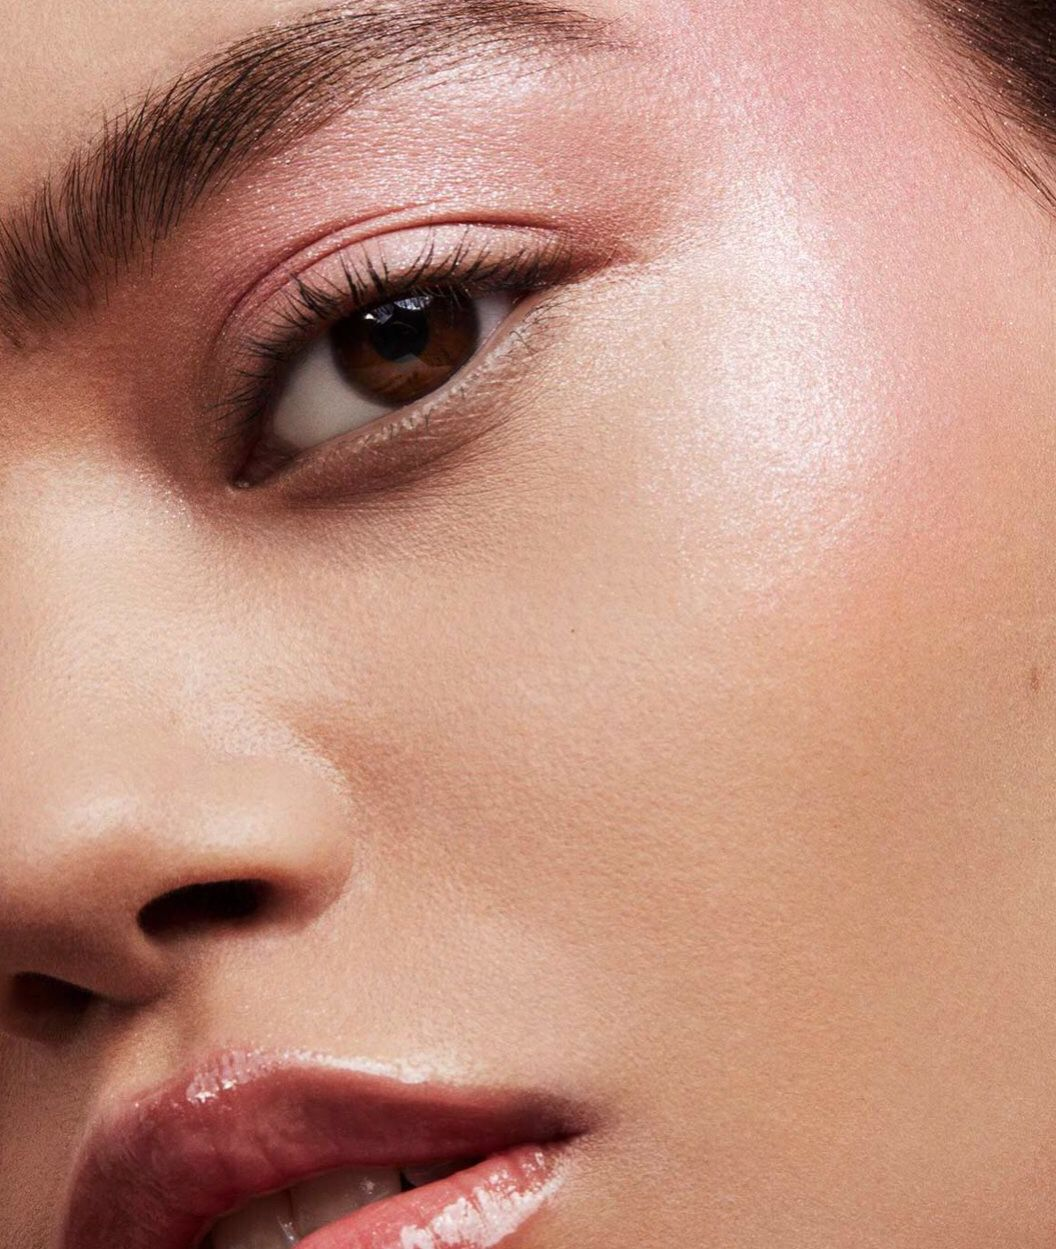 Frencheconomie Spring 2019 Cosmetics Lookbook Fenty Beauty Killawatt Baby Pink Highlighter Pink Lips Fenty Beauty How To Apply Eyeliner